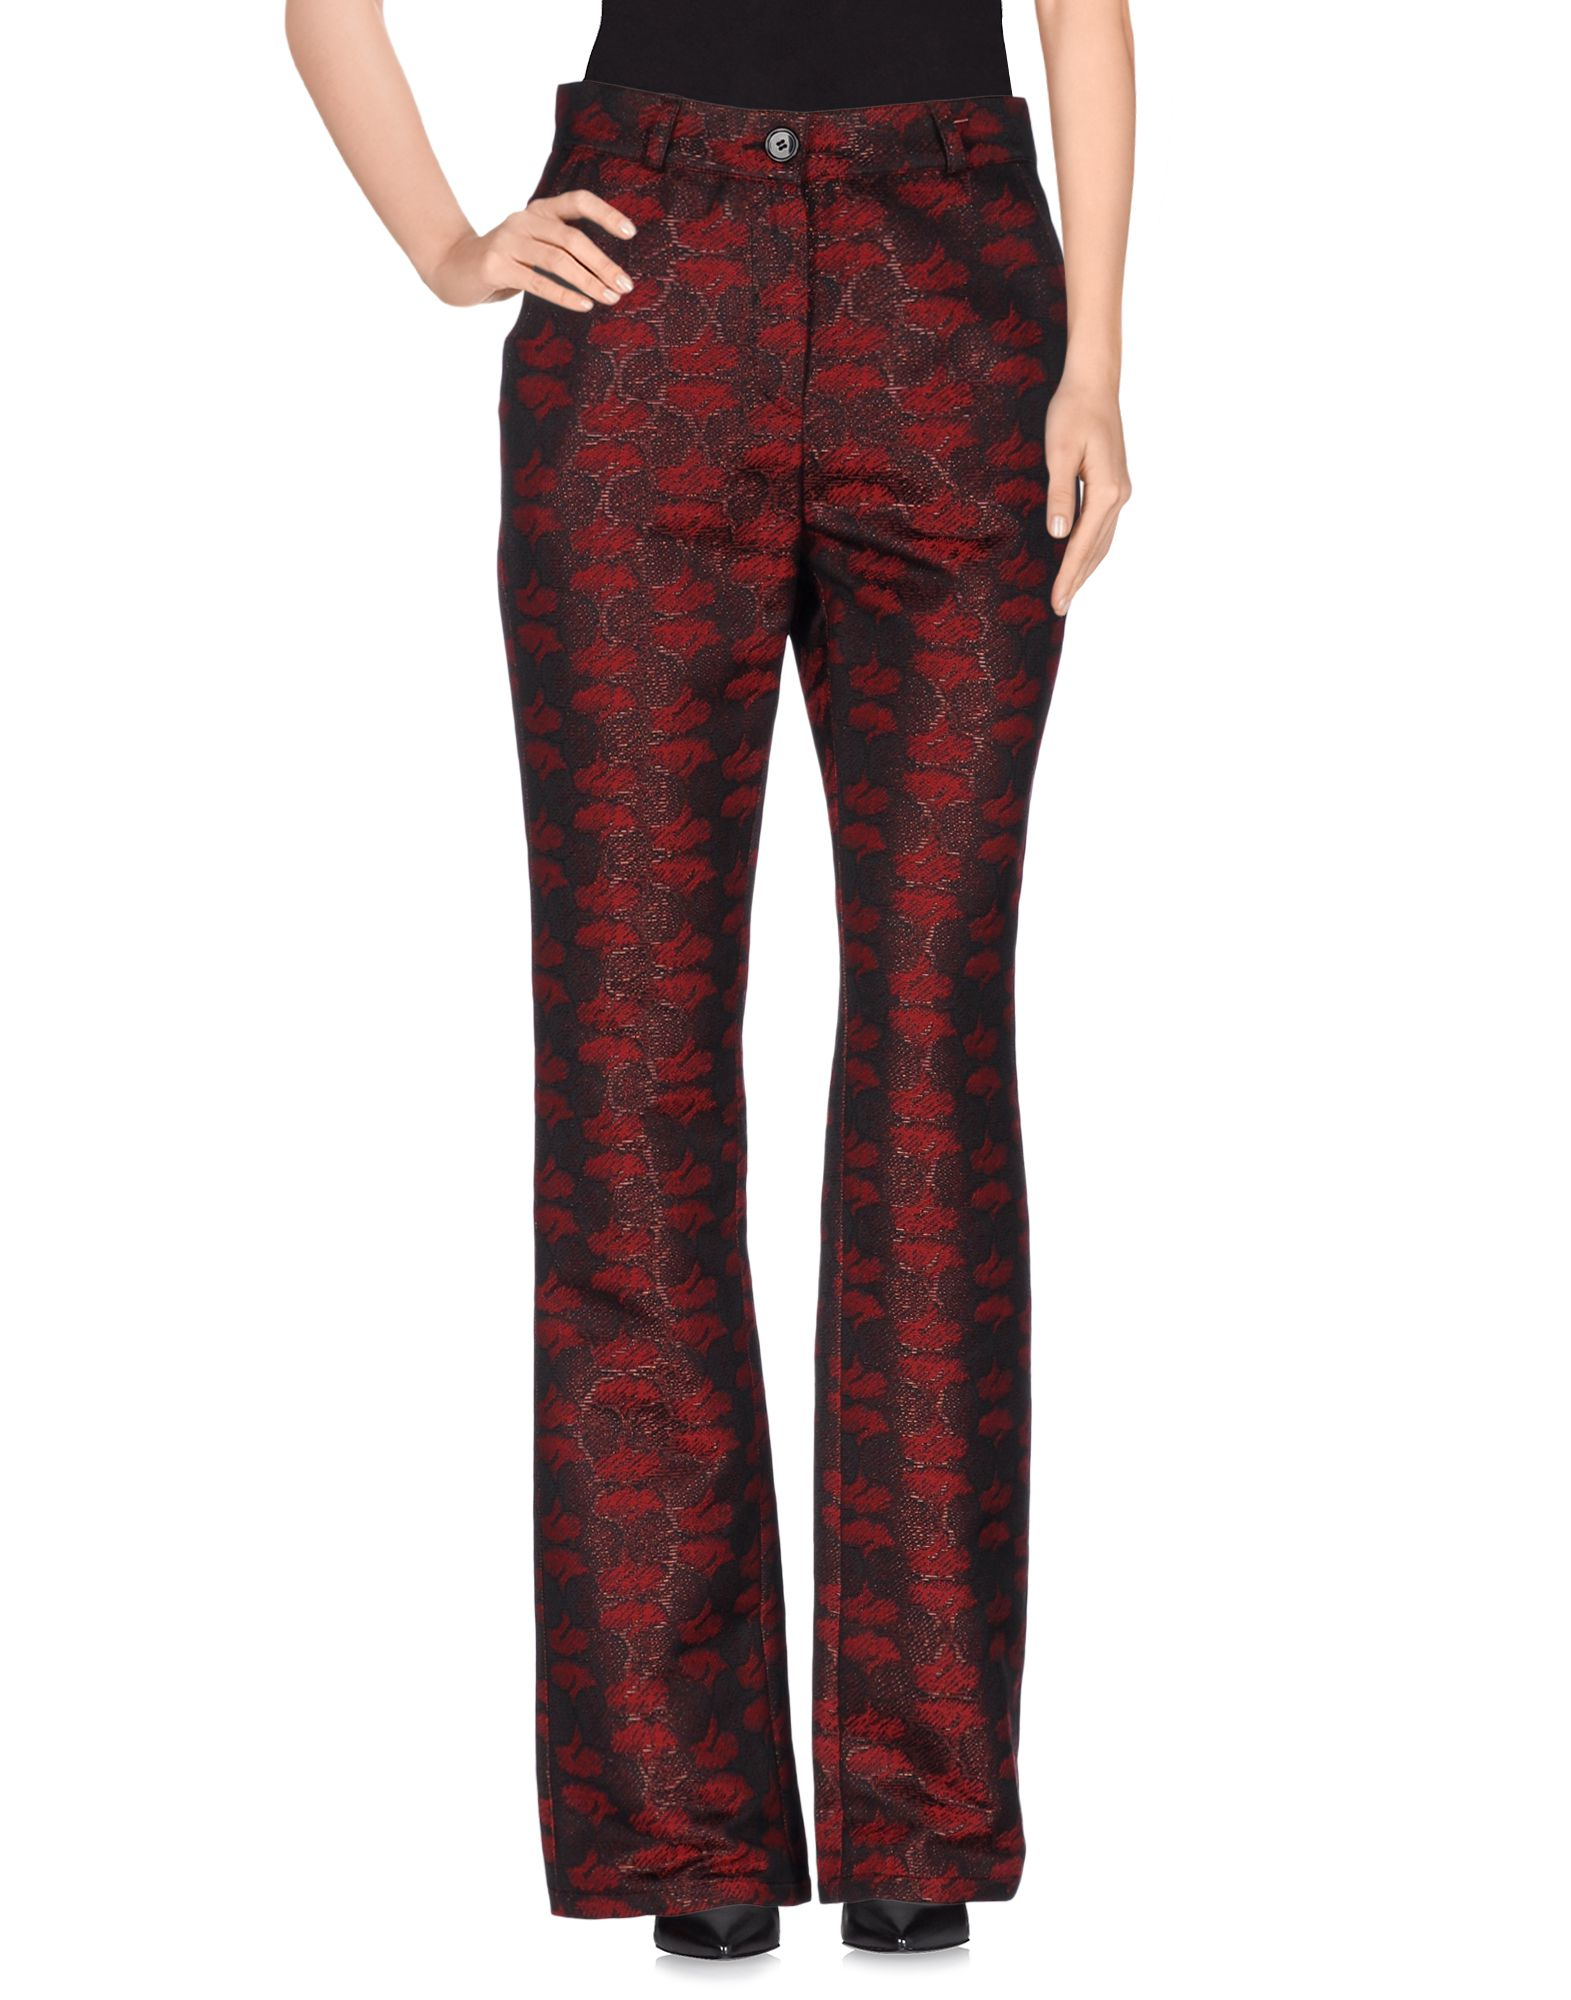 Brilliant Black Maroon Slouch Elastic Waist Women39s Dress Pants Size Medium M